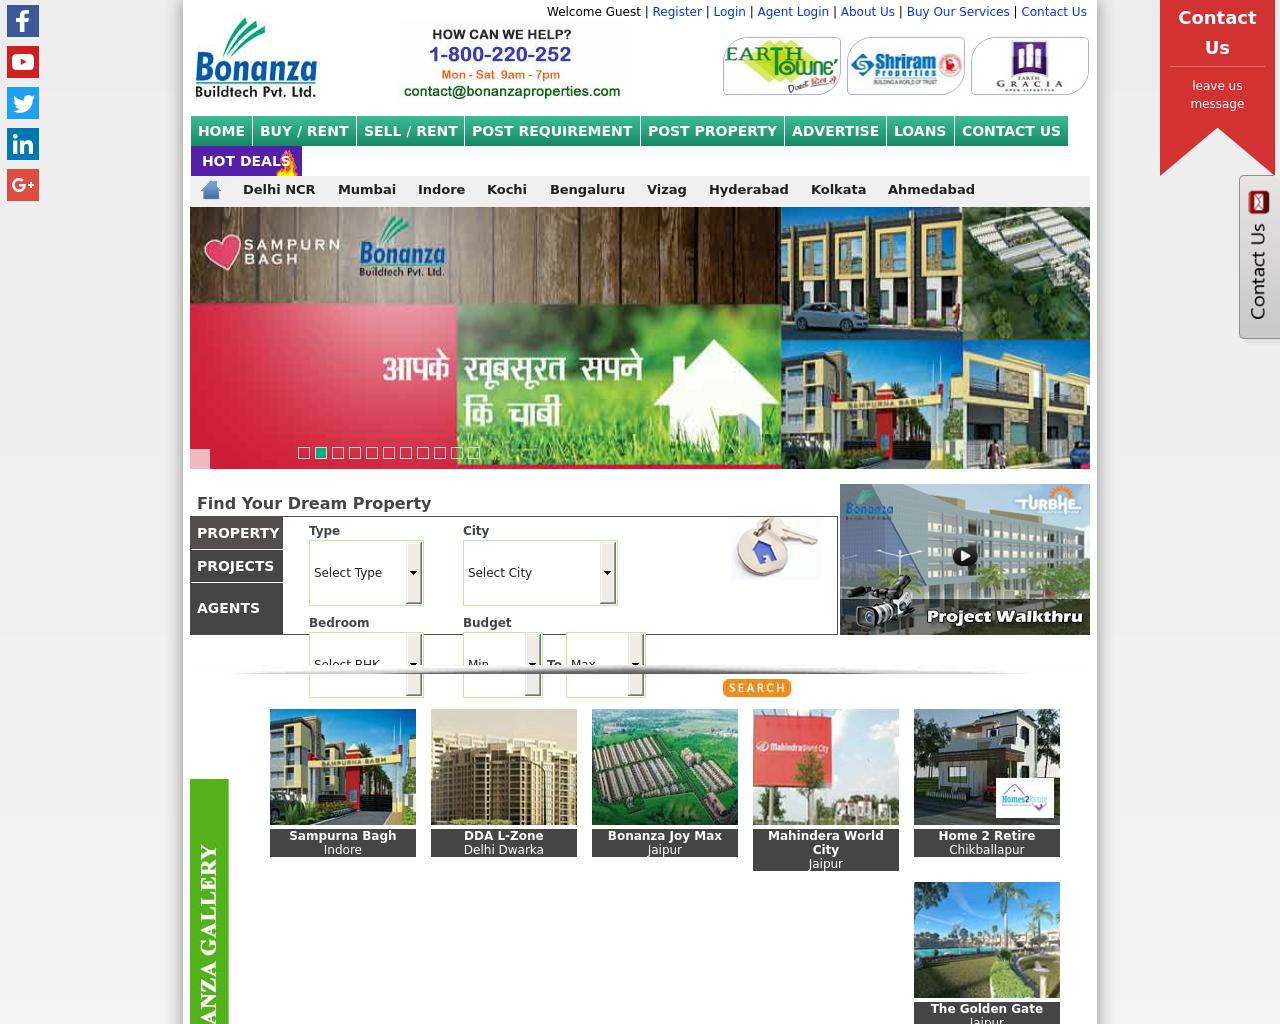 Bonanza-Builtech-Pvt.-Ltd.-Advertising-Reviews-Pricing